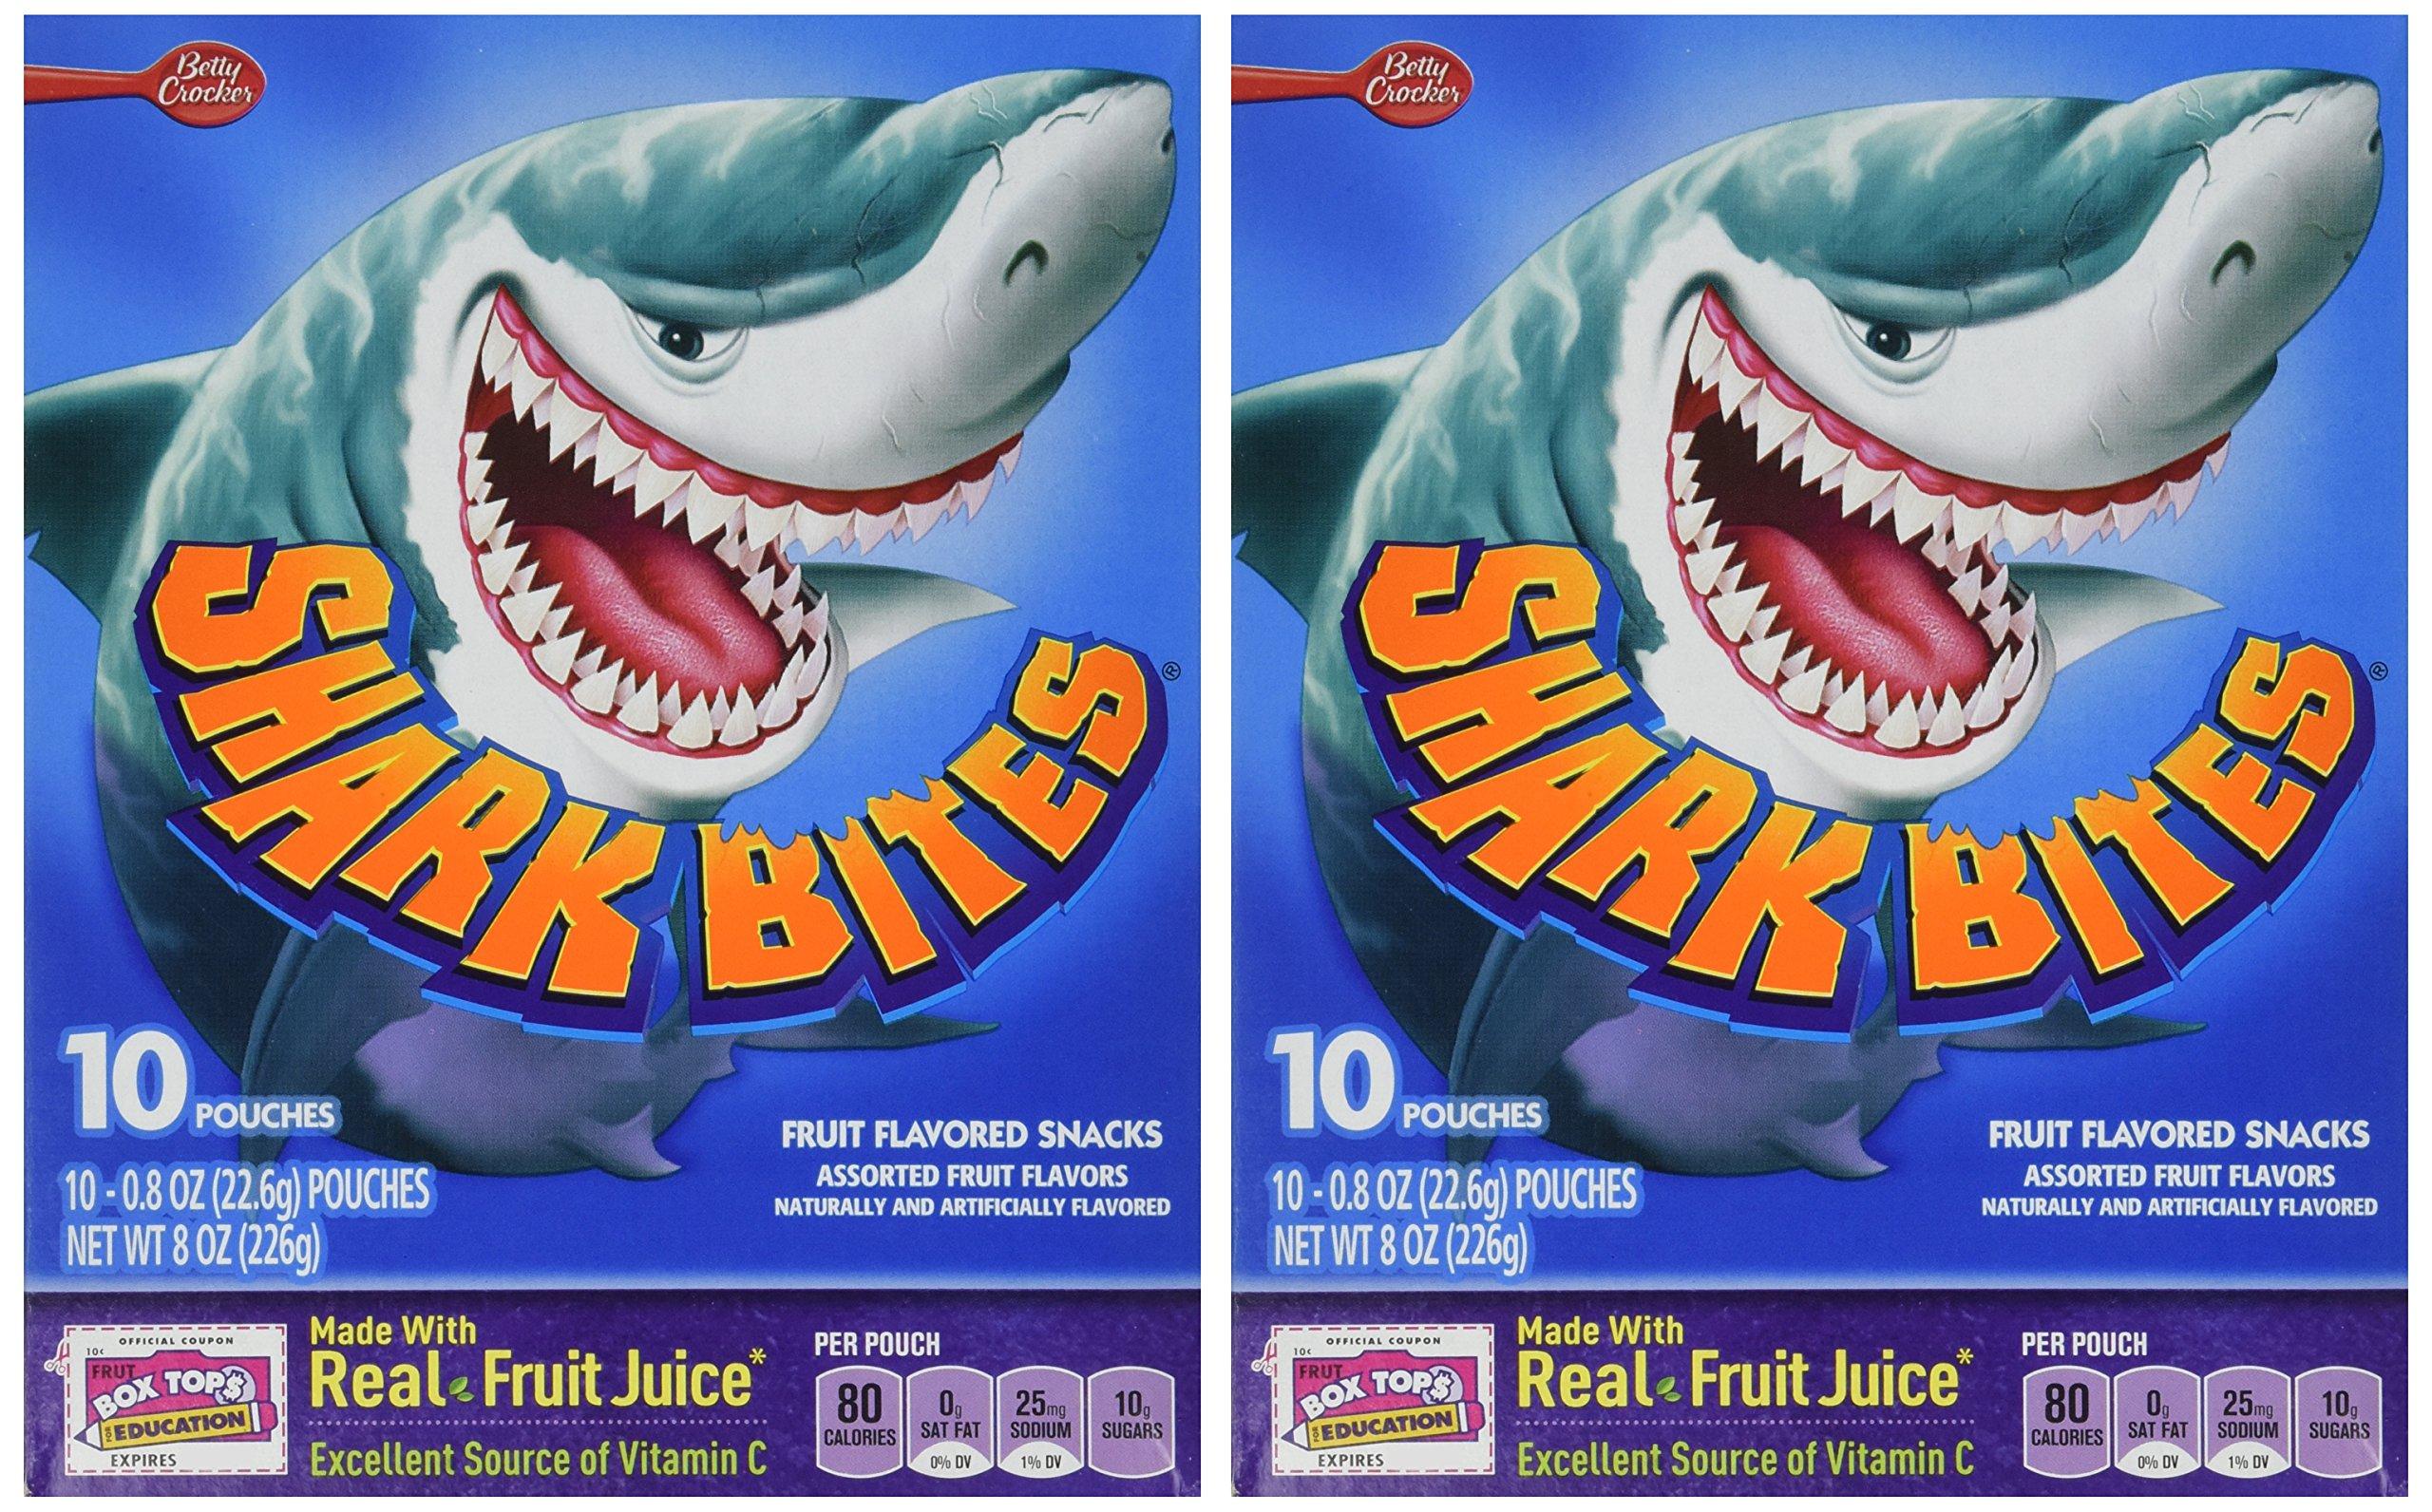 Betty Crocker Shark Bites Fruit Flavored Snacks - 8 oz box (2 Pack) by Betty Crocker (Image #2)